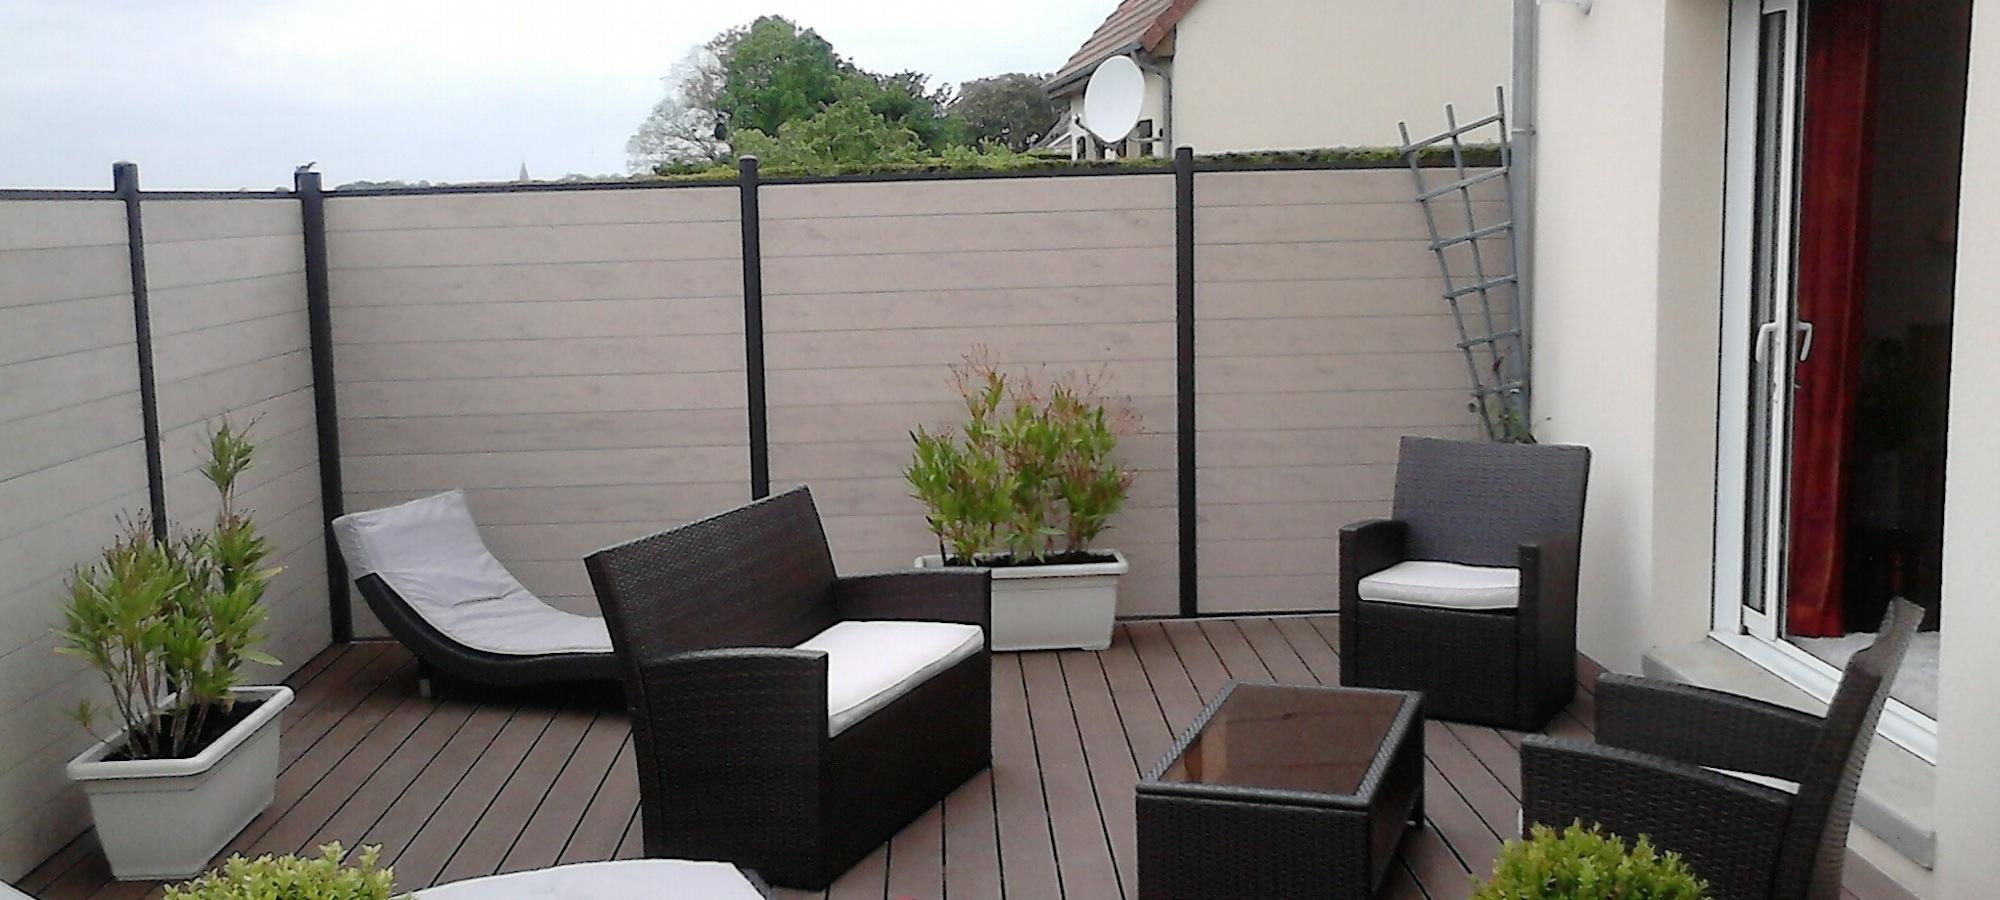 terrasse bois composite sur dalle beton veranda. Black Bedroom Furniture Sets. Home Design Ideas